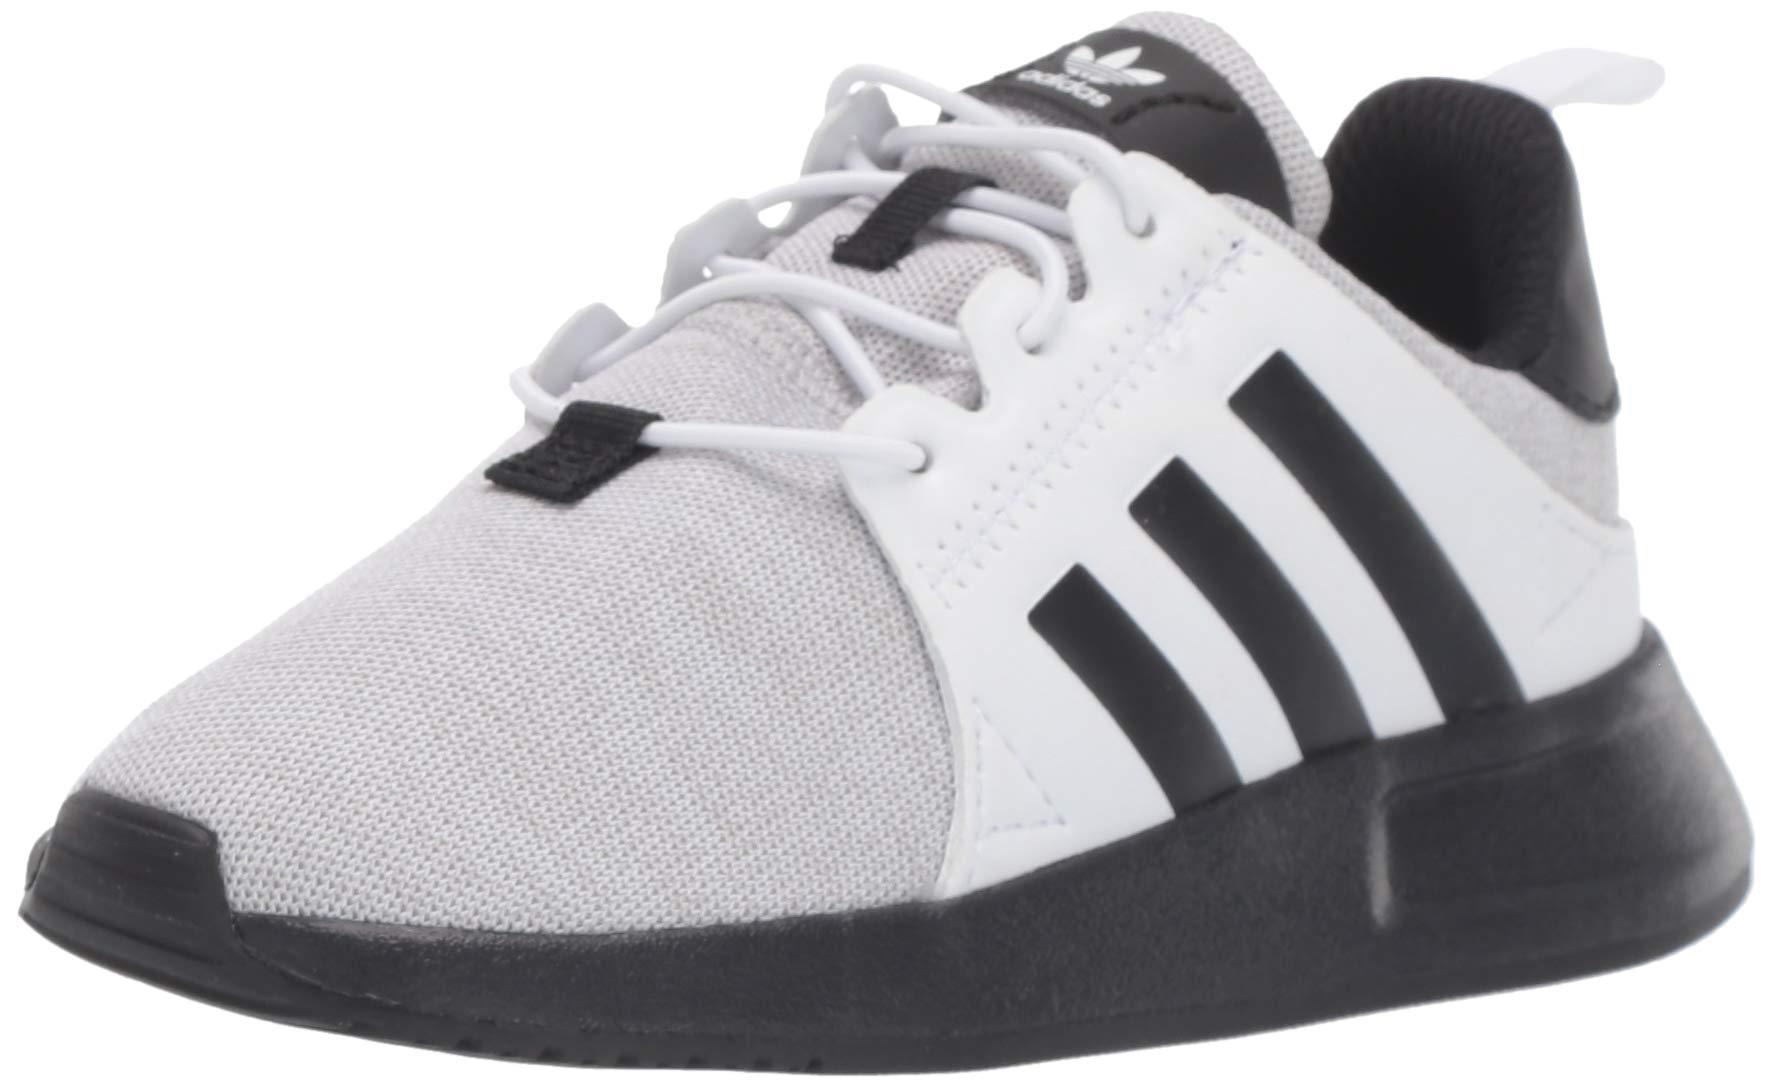 adidas Originals Baby X_PLR Running Shoe, Light Grey Heather/Black/White, 7K M US Toddler